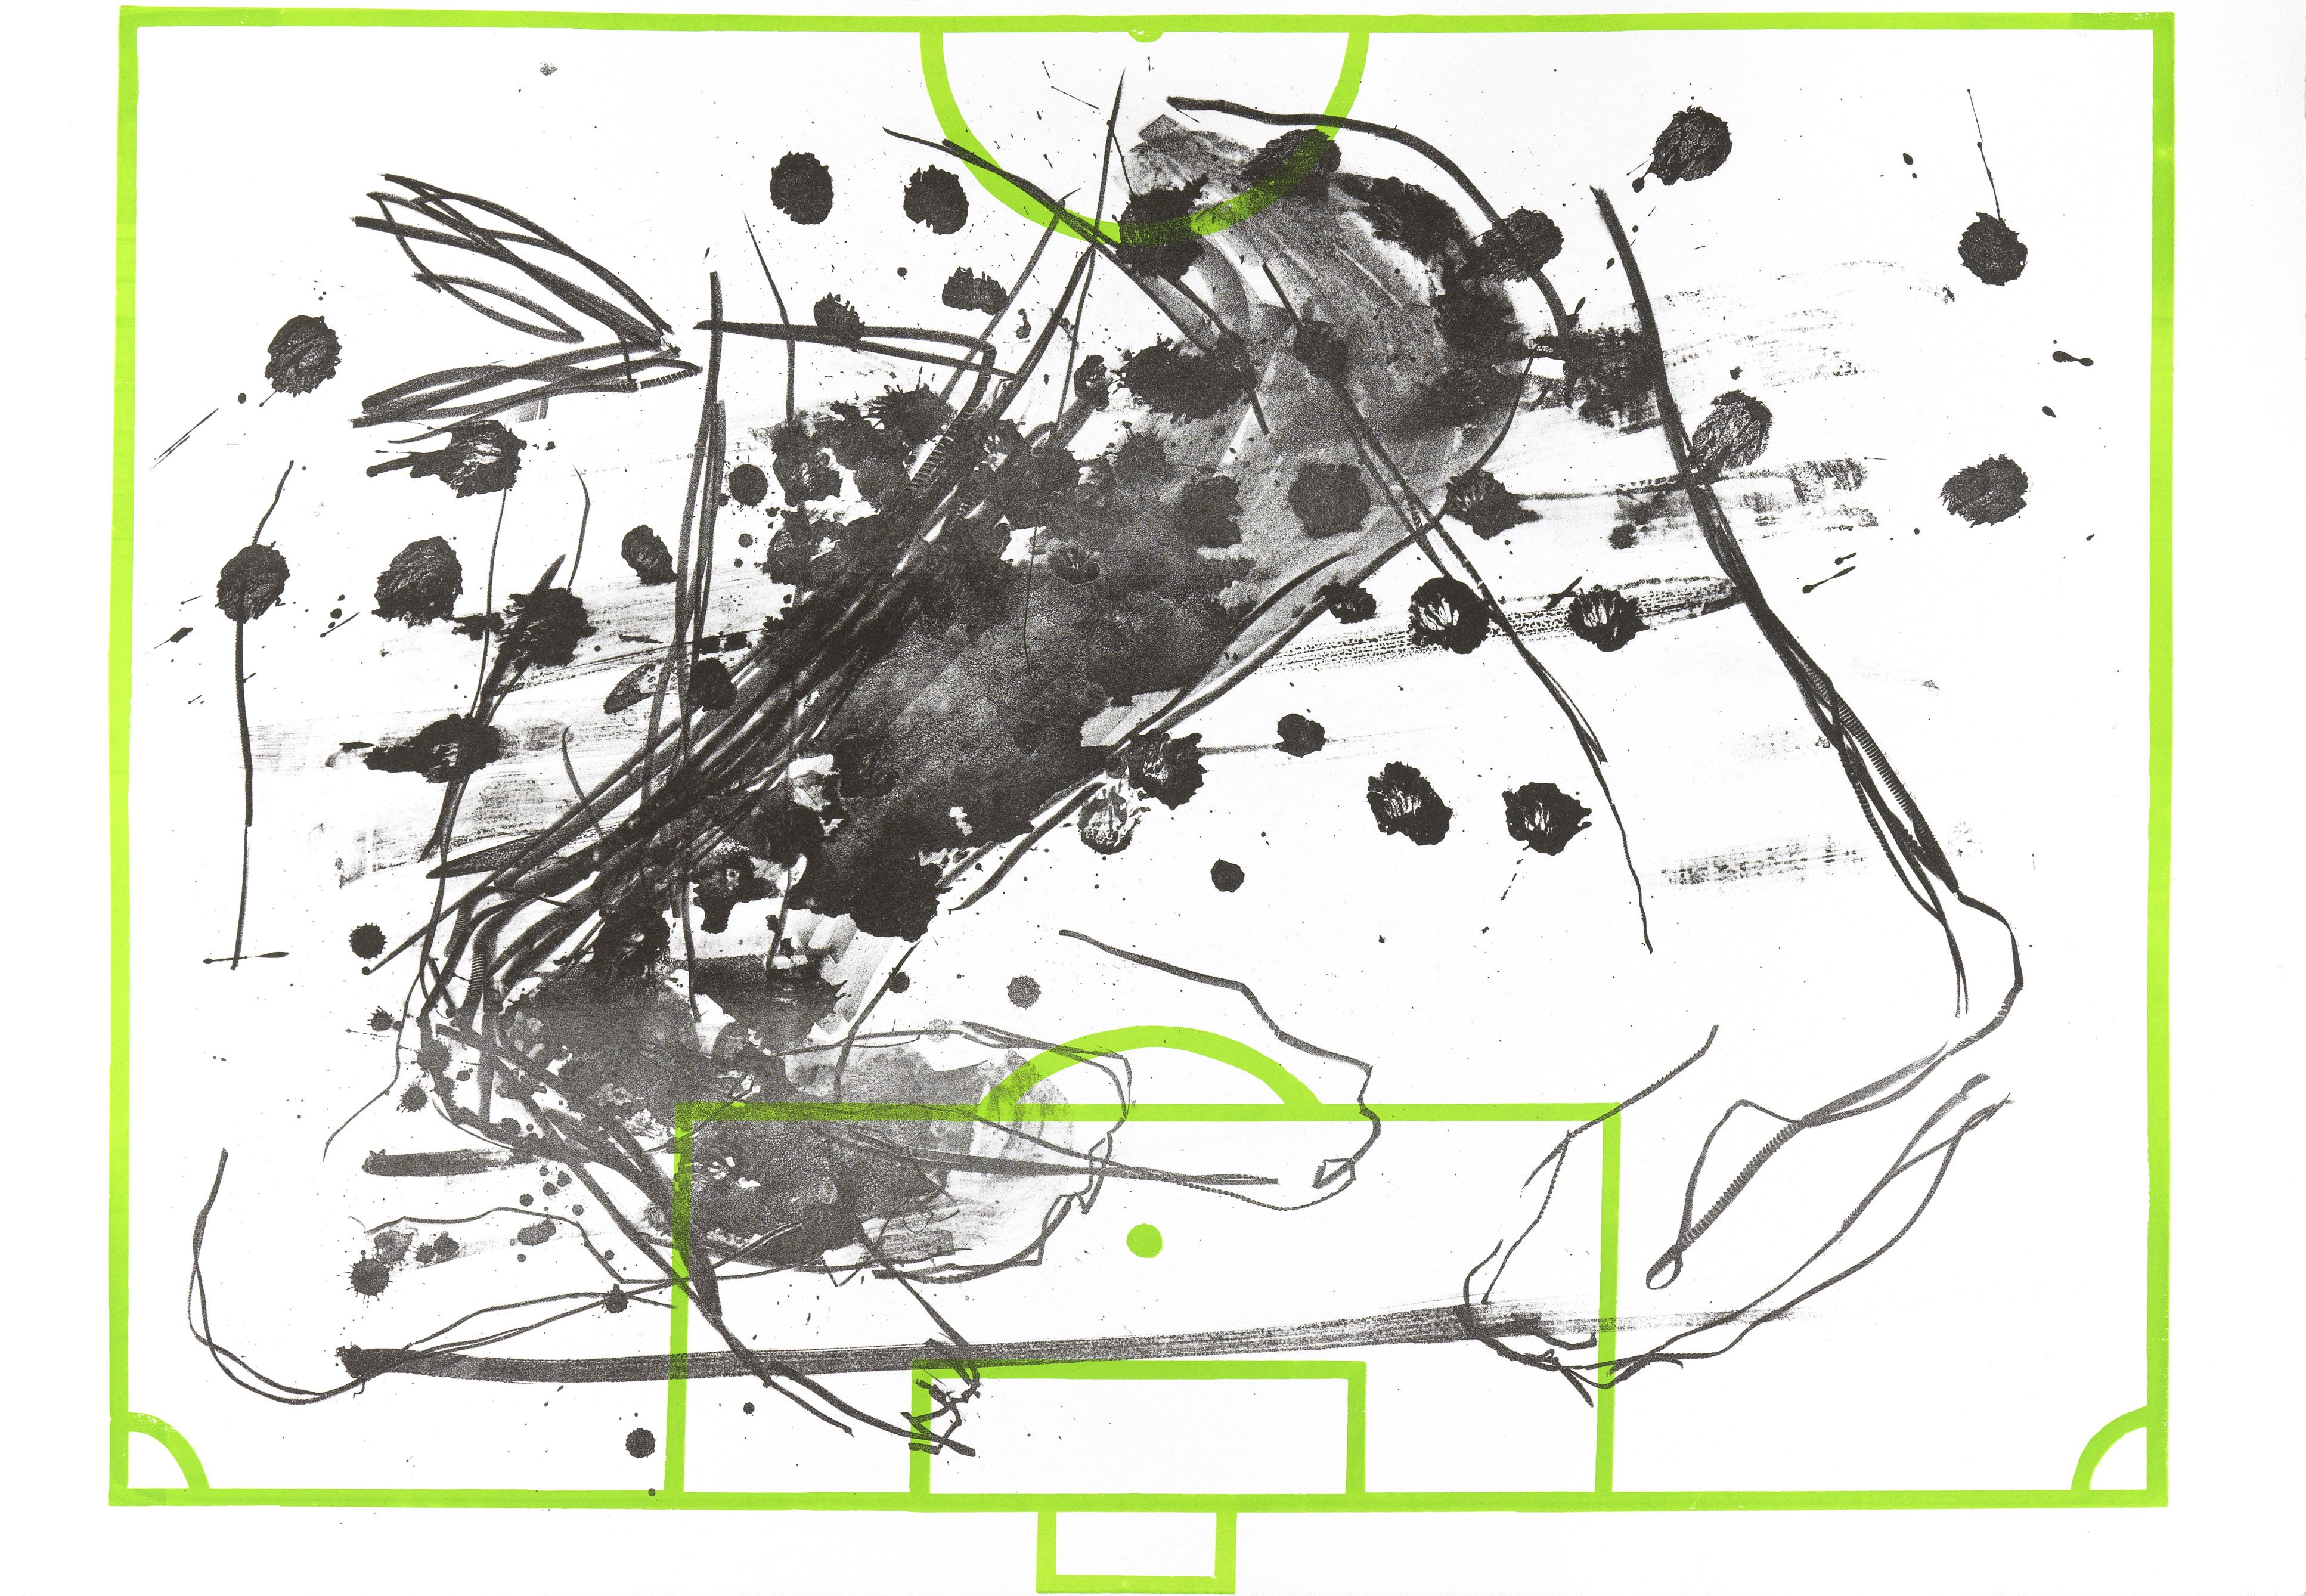 Art / Kunst, Print, Printmaking, Grafik, Druckgrafik, Artist/Künstler: Heike Keller, Title/Titel: Flankengott I, Technique/Technik: Lithography & Screenprint  / Lithografie & Siebdruck, Price/Preis: 490,- €